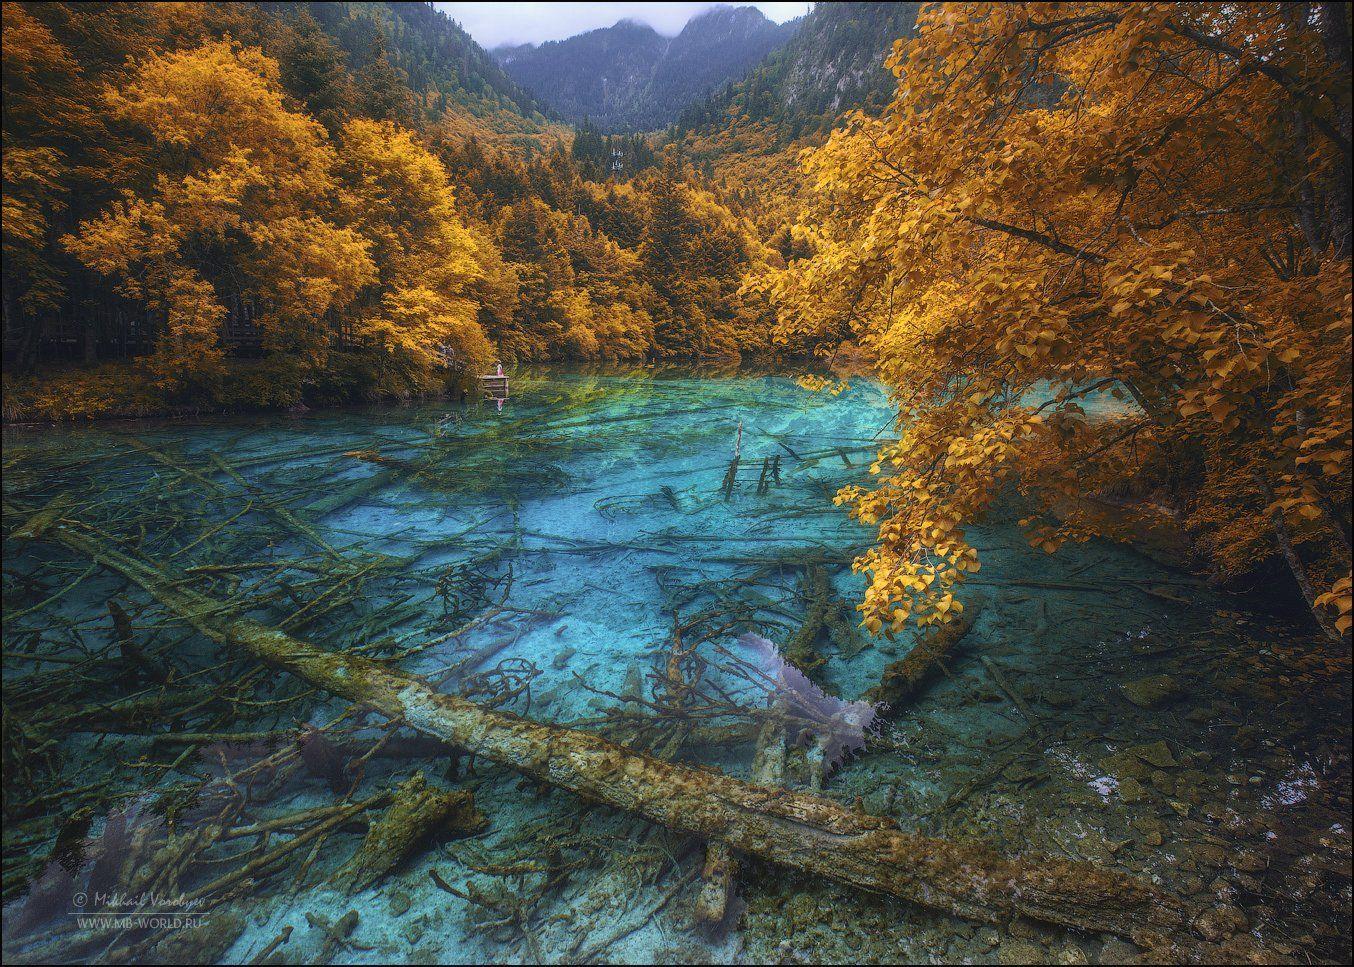 Китай, Цзючжайгоу,природа, парк, озеро, , Михаил Воробьев